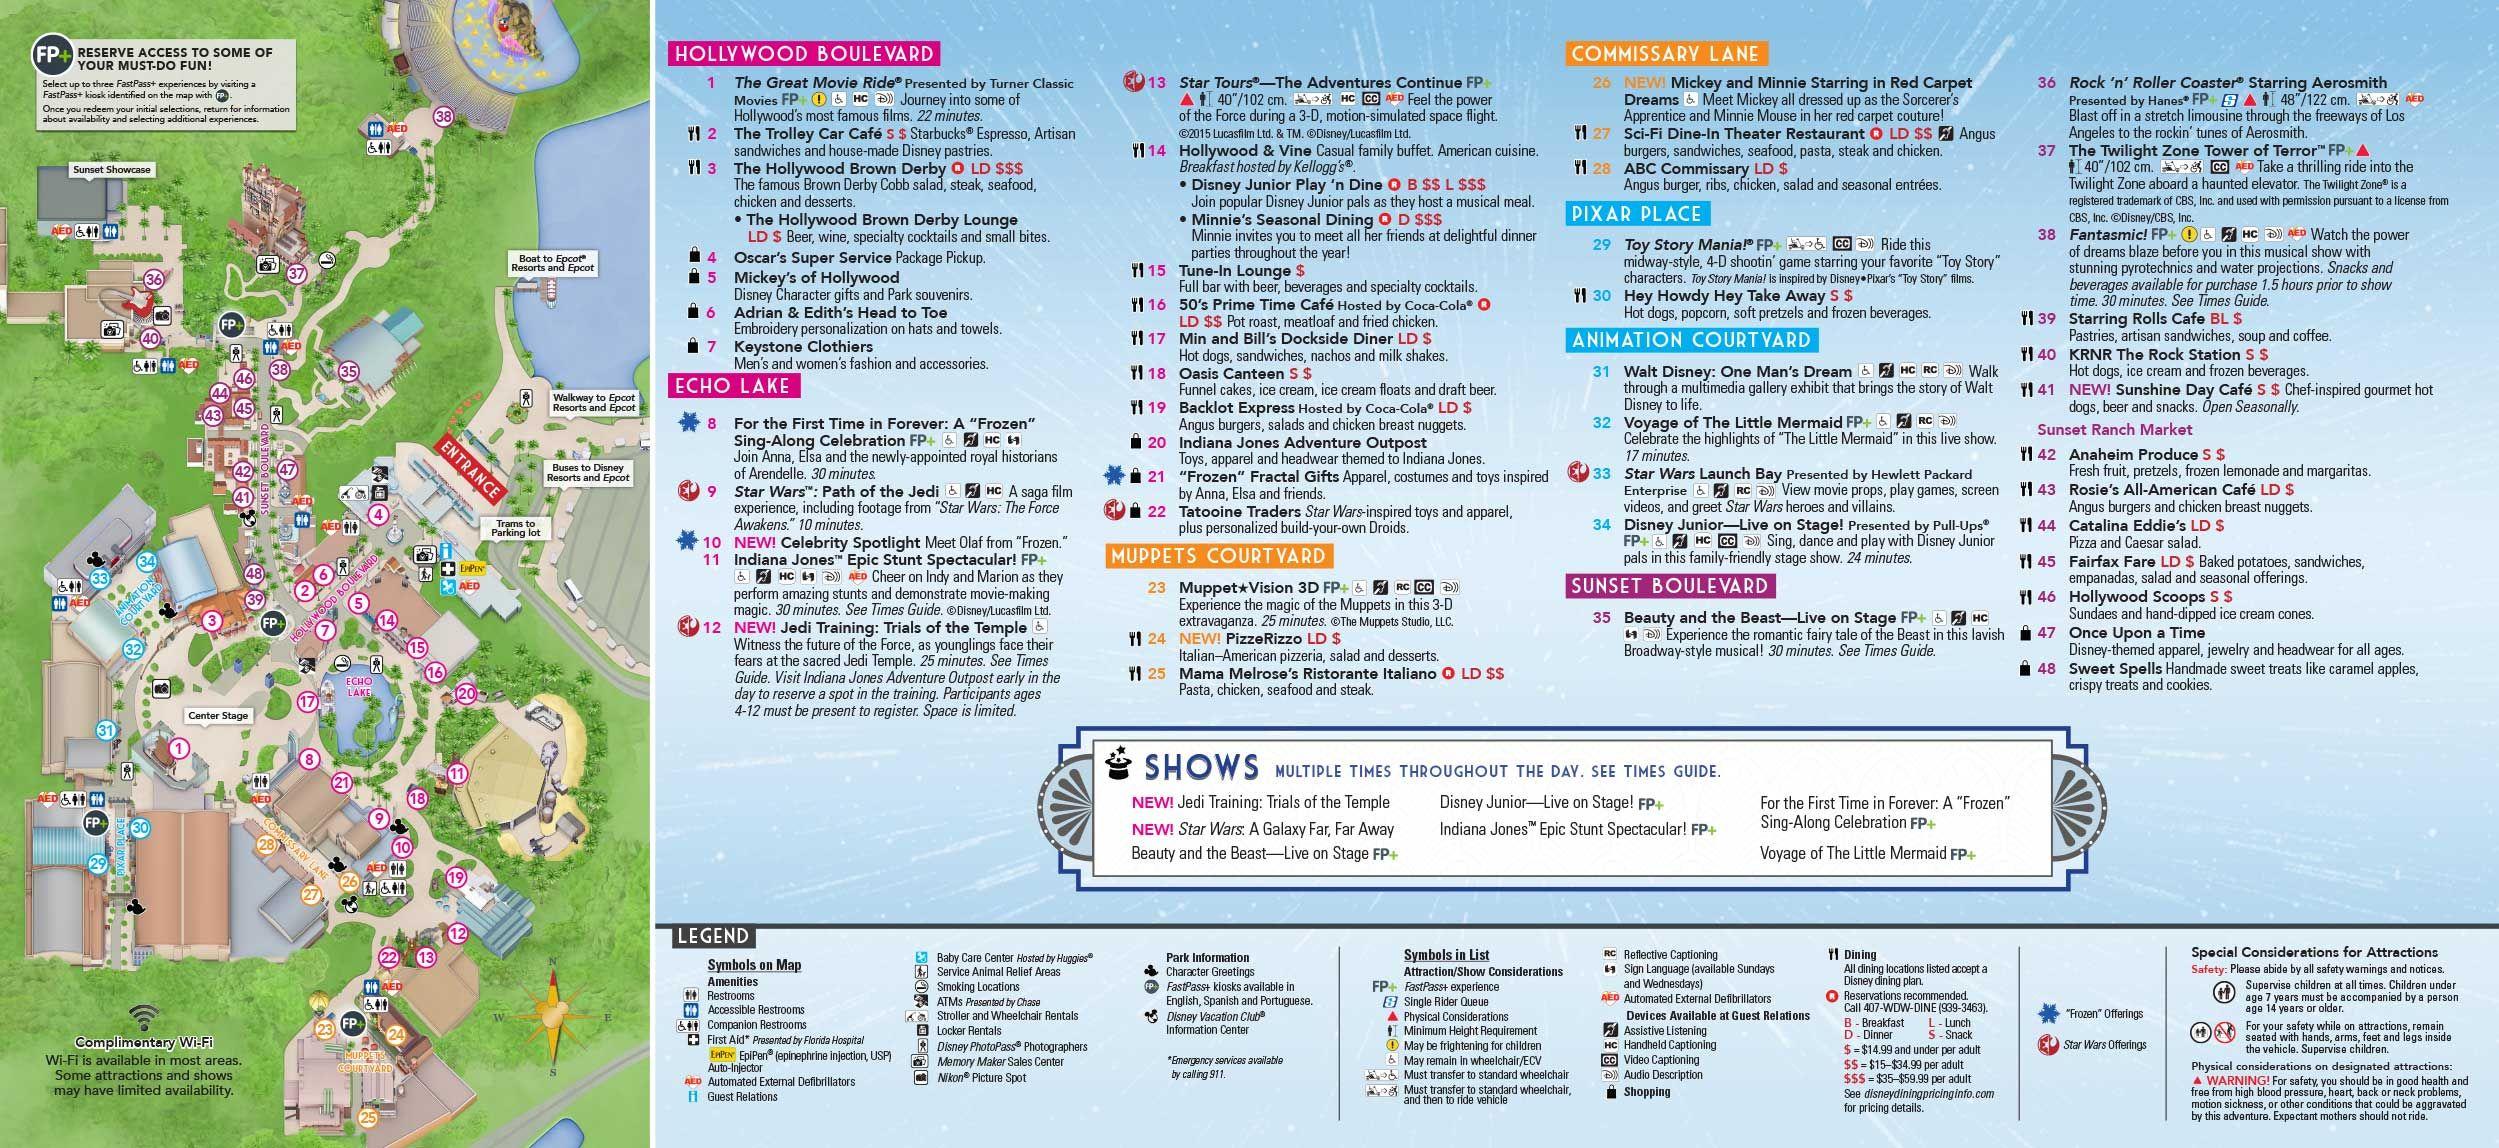 Disneys hollywood studios map at walt disney world disney disney disneys hollywood studios map at walt disney world gumiabroncs Gallery